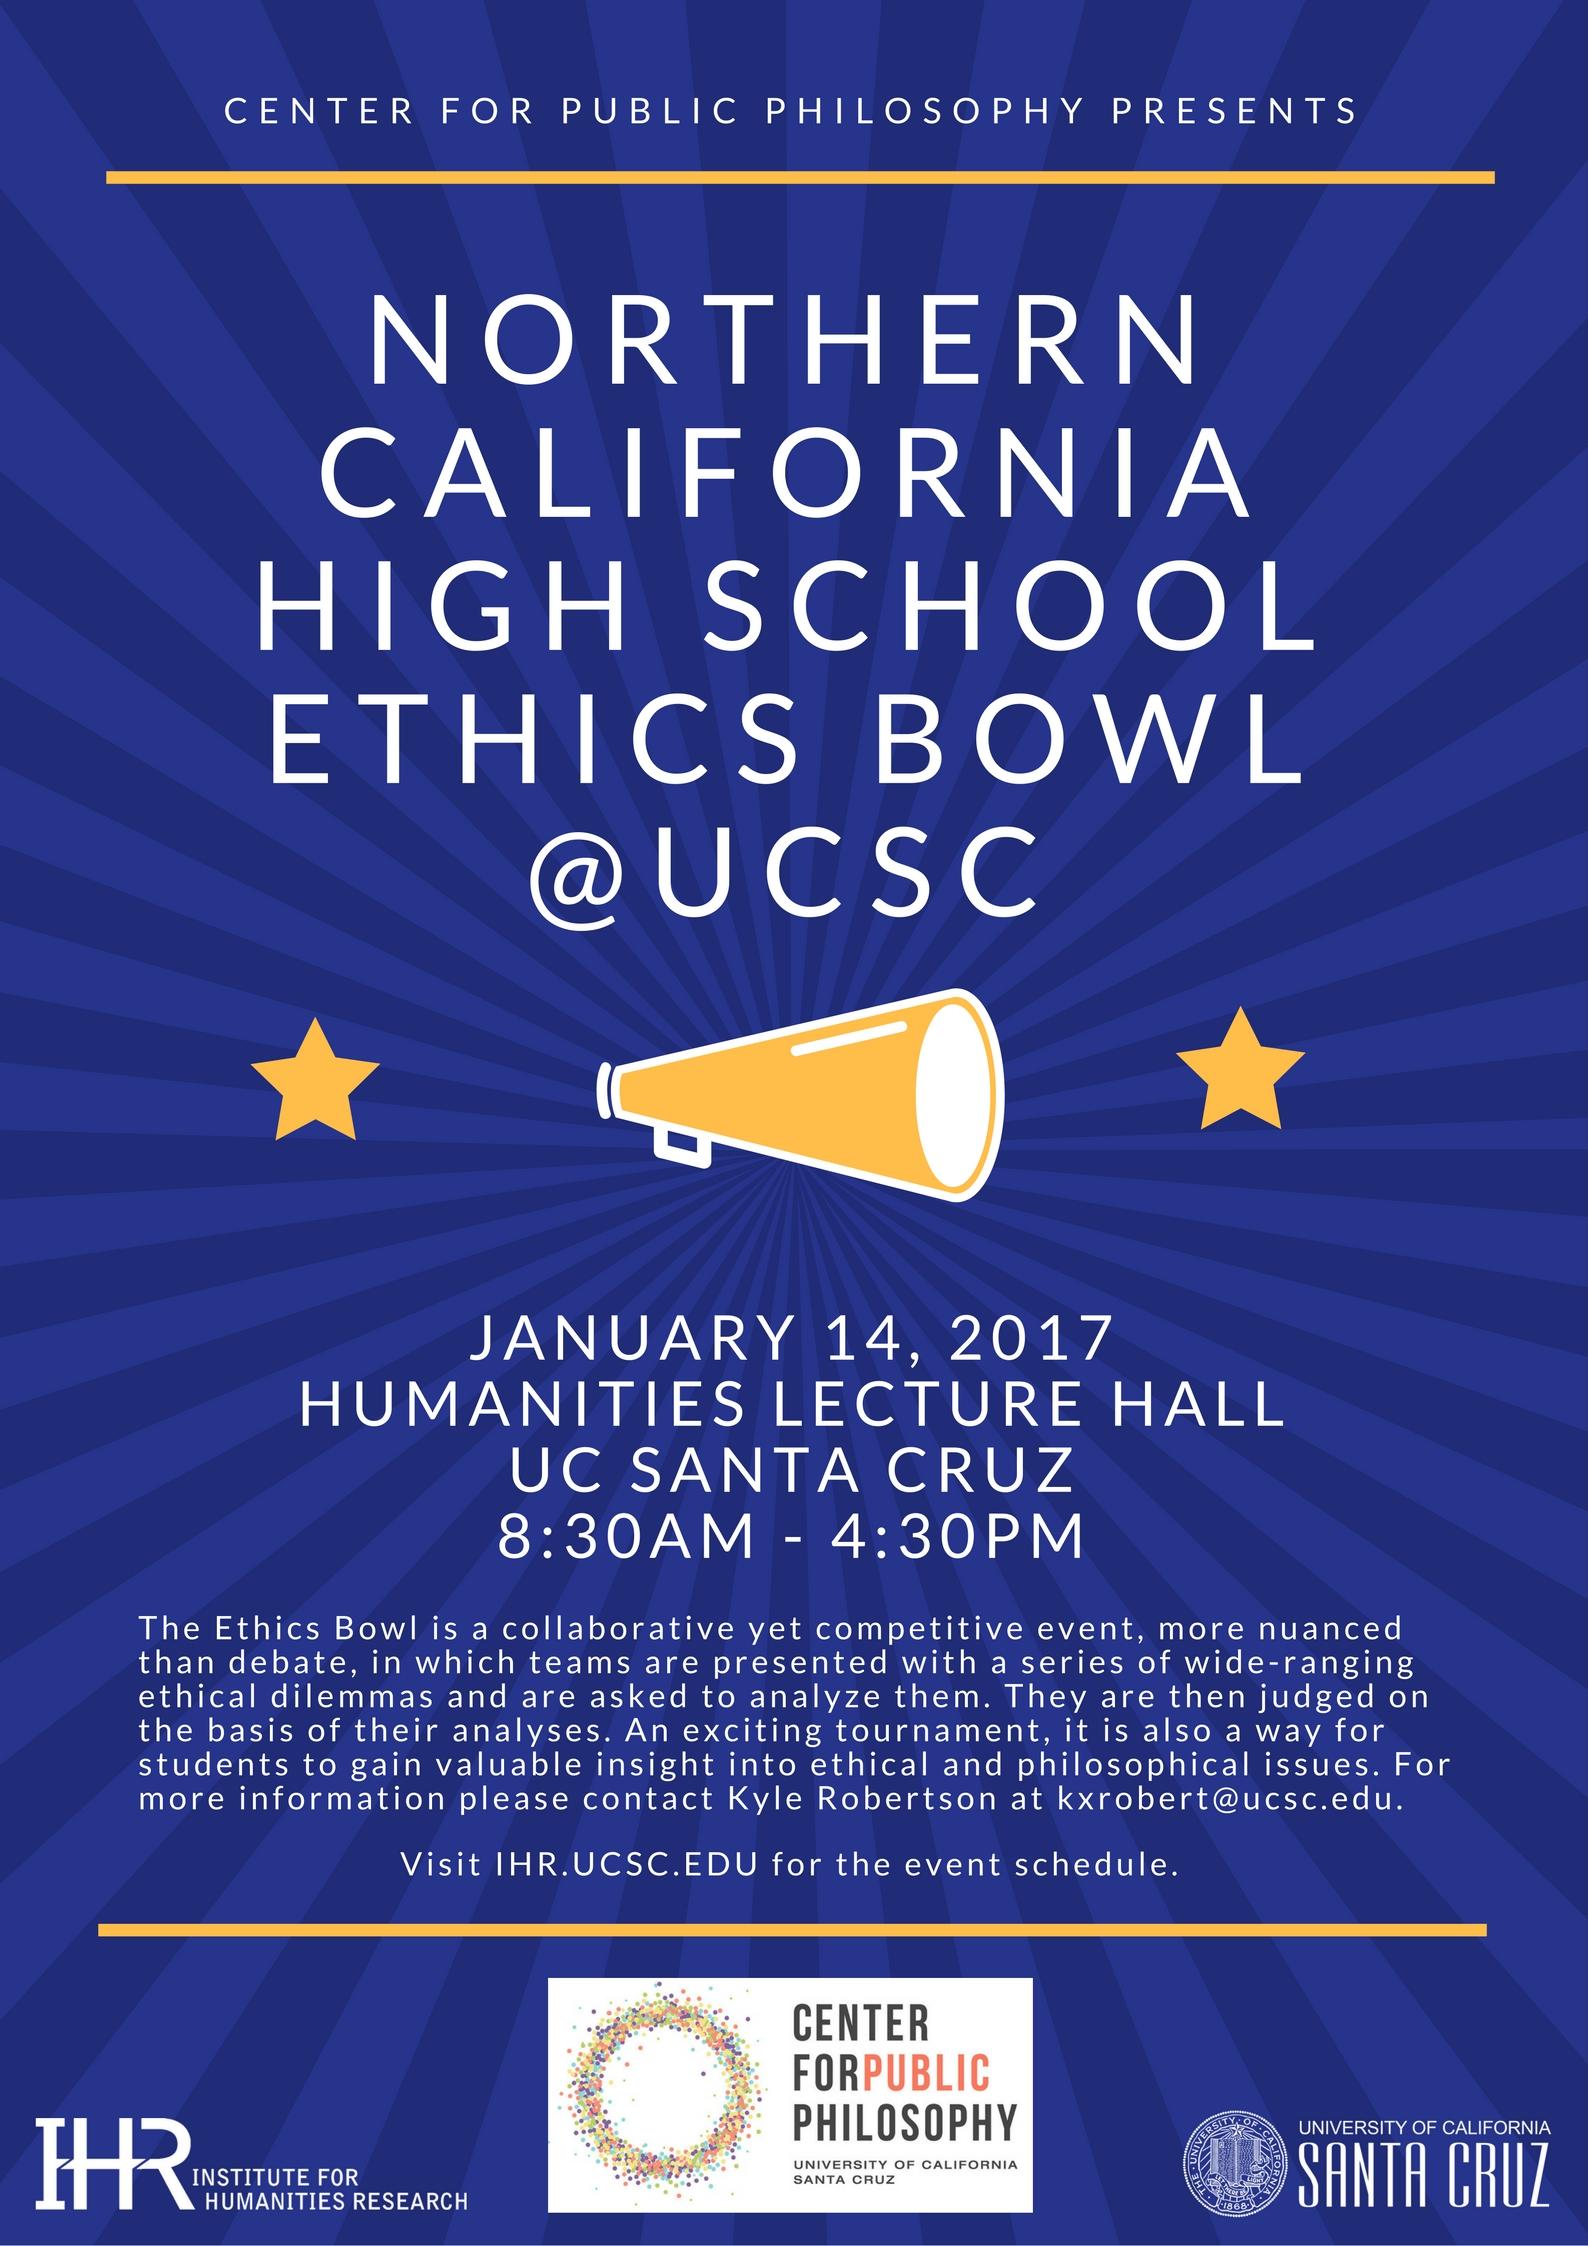 High School Ethics Bowl flyer 2017